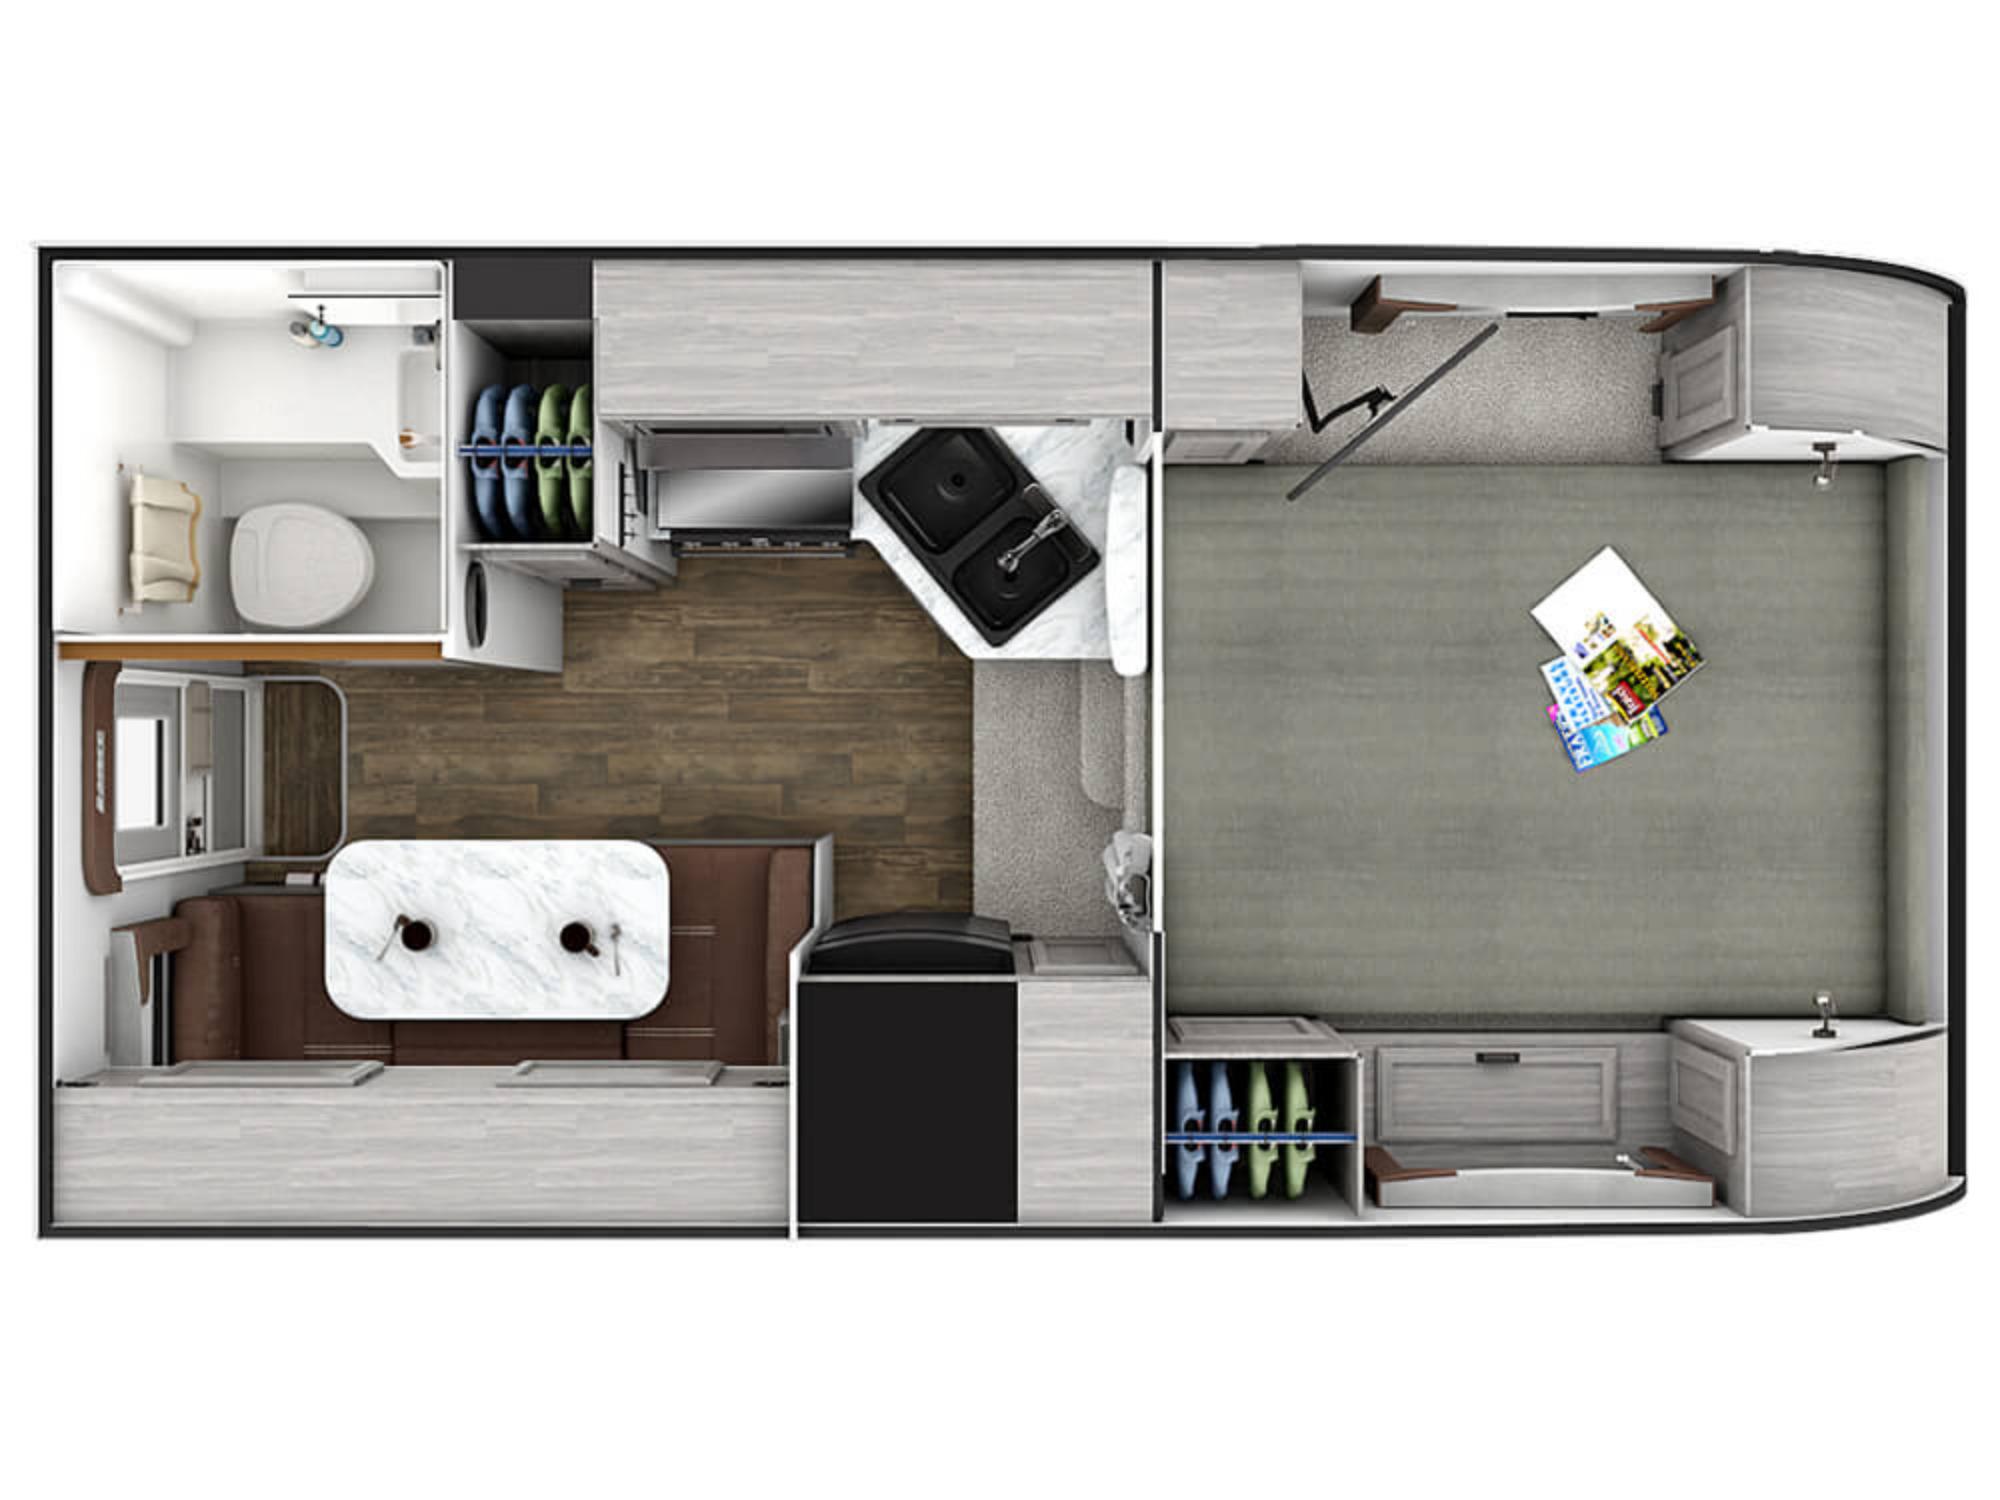 View Floor Plan for 2021 LANCE LANCE 850